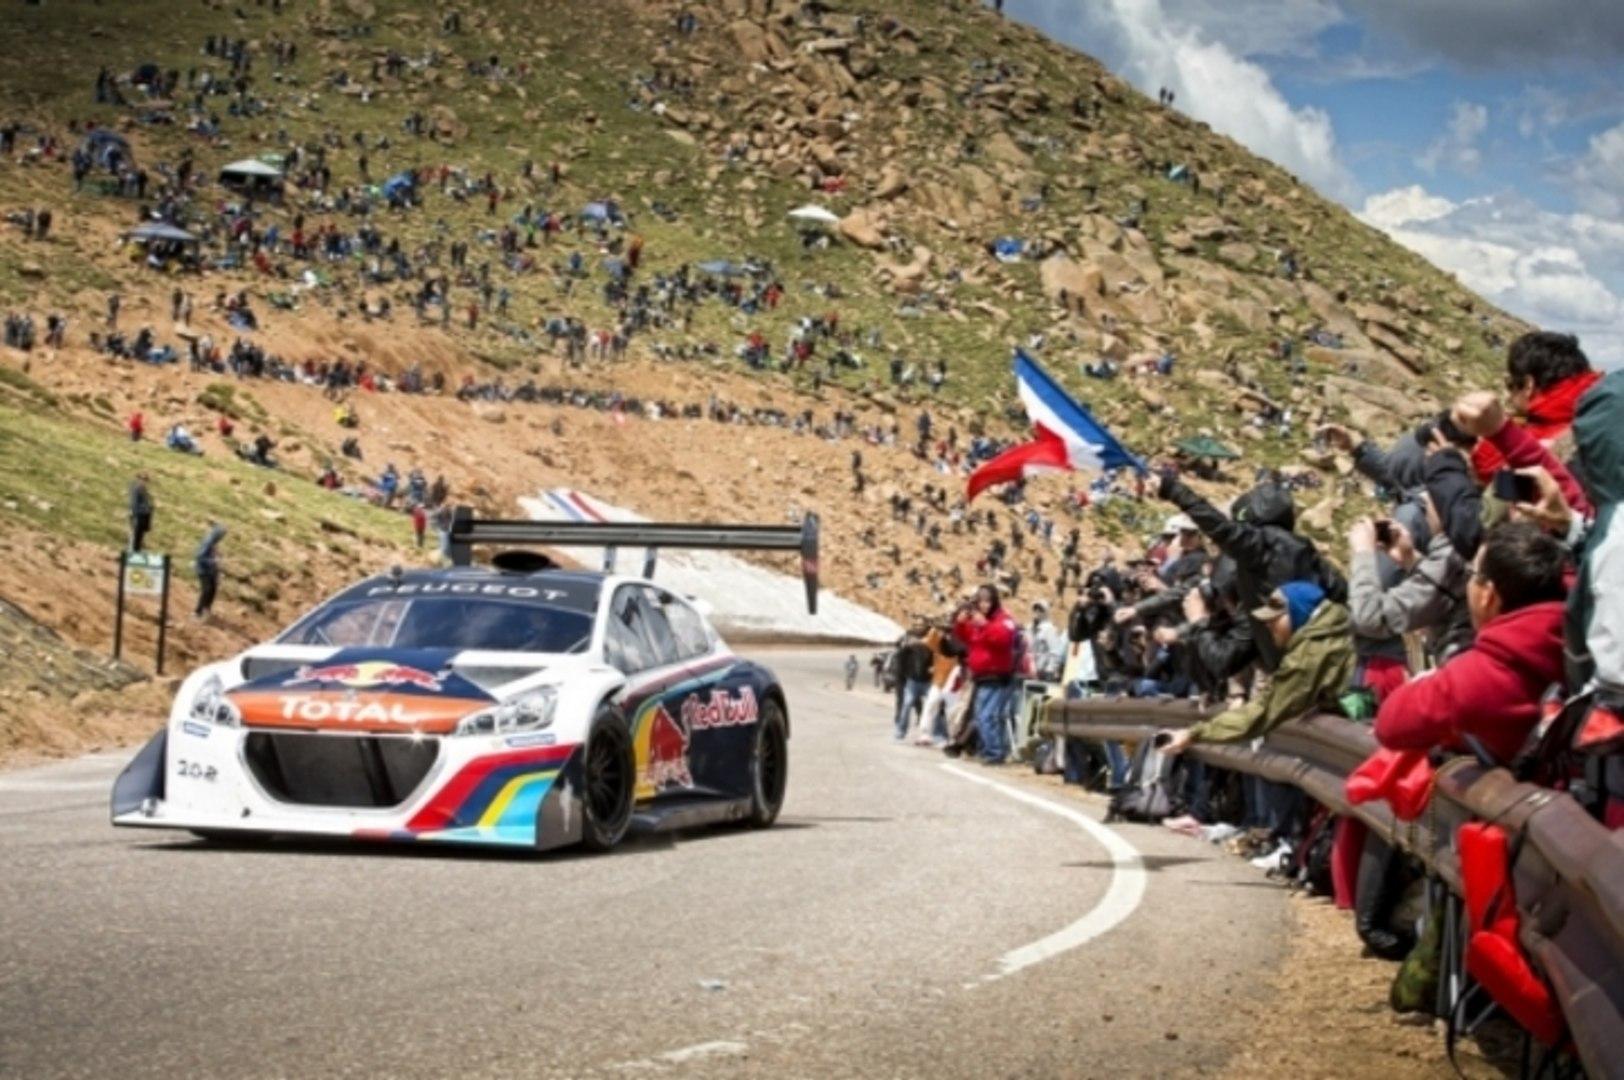 Pikes Peak 2013 : record de Loeb en Peugeot 208 T16